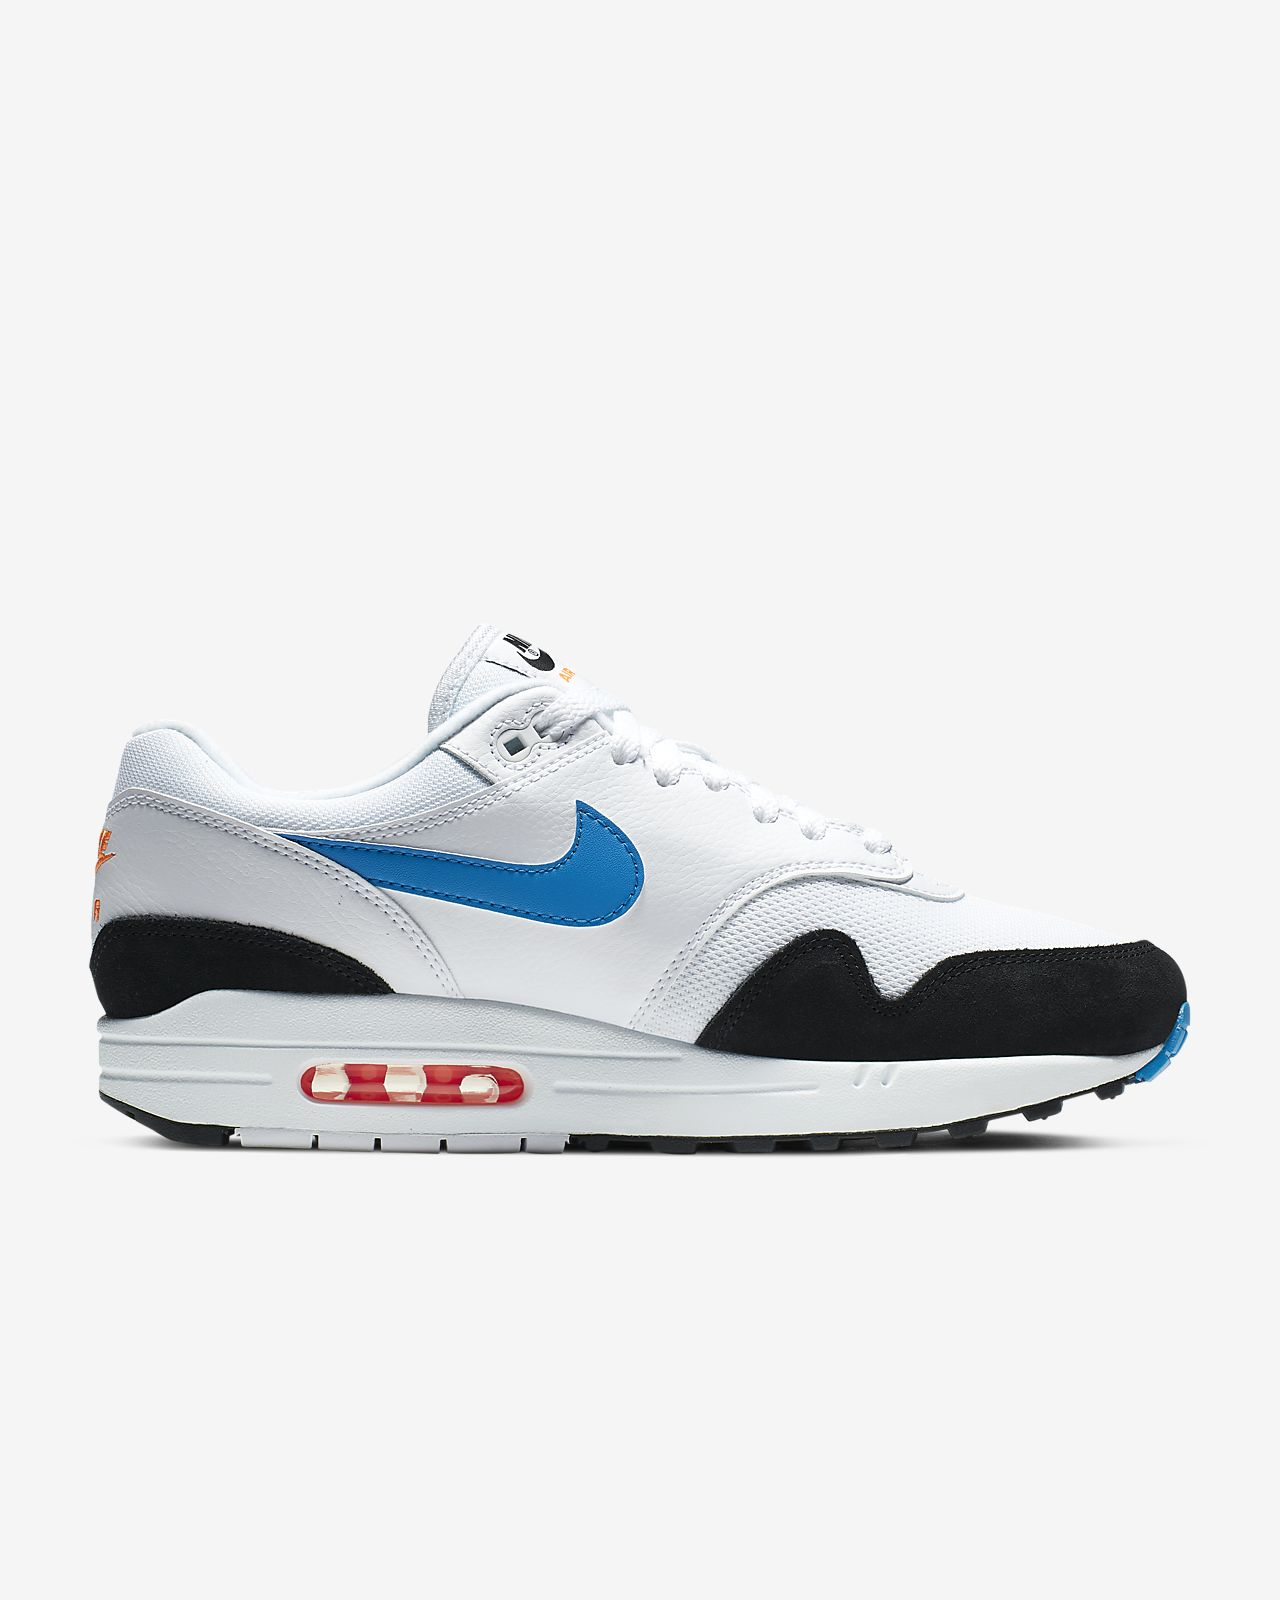 d5ba1c16a0da Nike Air Max 1 Men s Shoe. Nike.com DK